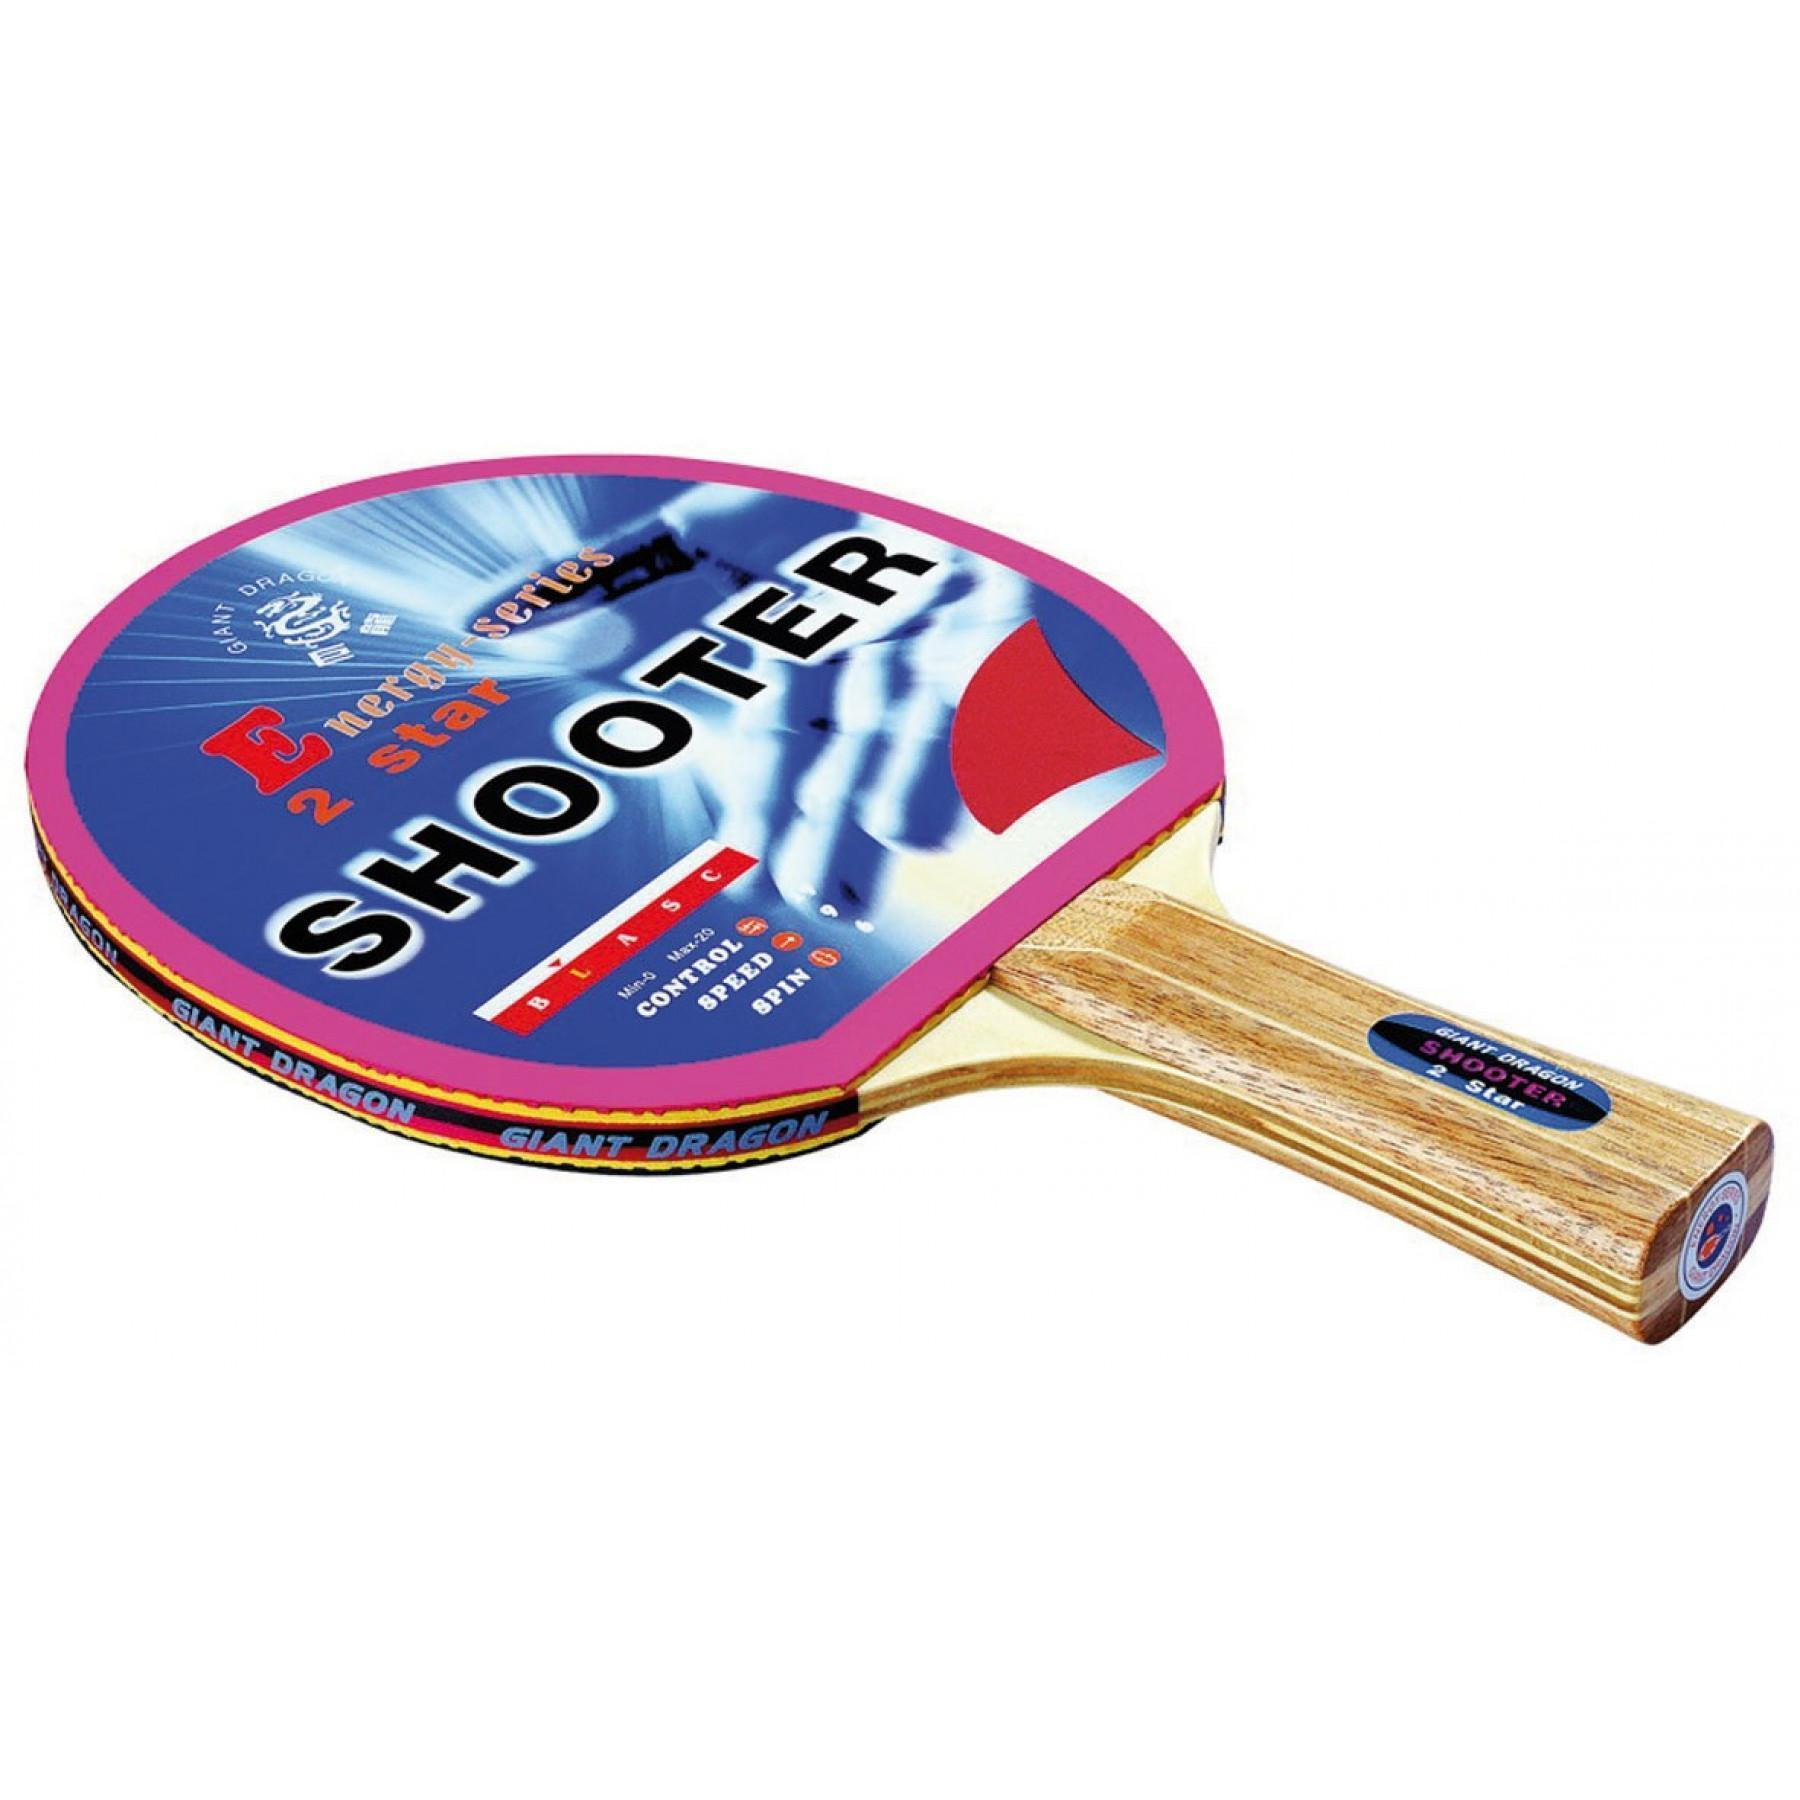 Sportifrance Shooter table tennis racket